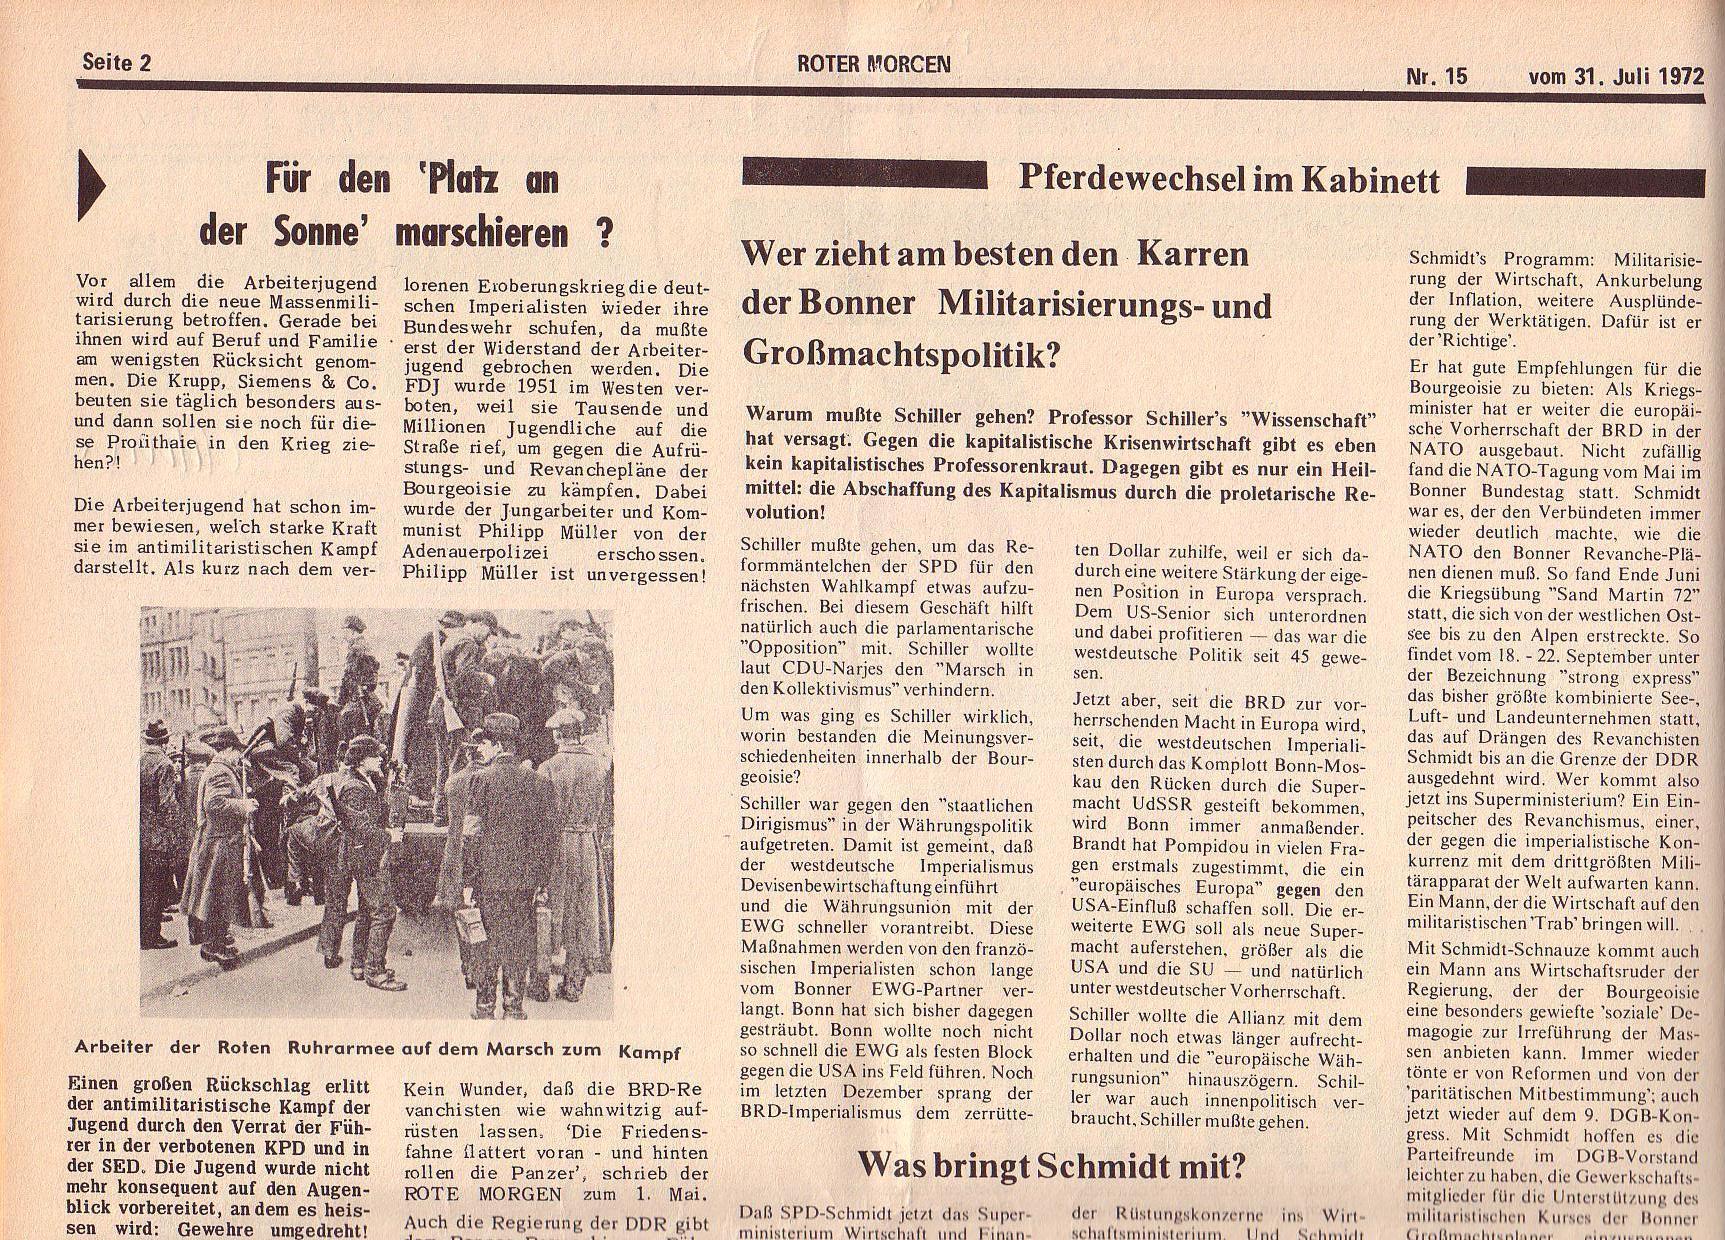 Roter Morgen, 6. Jg., 31. Juli 1972, Nr. 15, Seite 2a